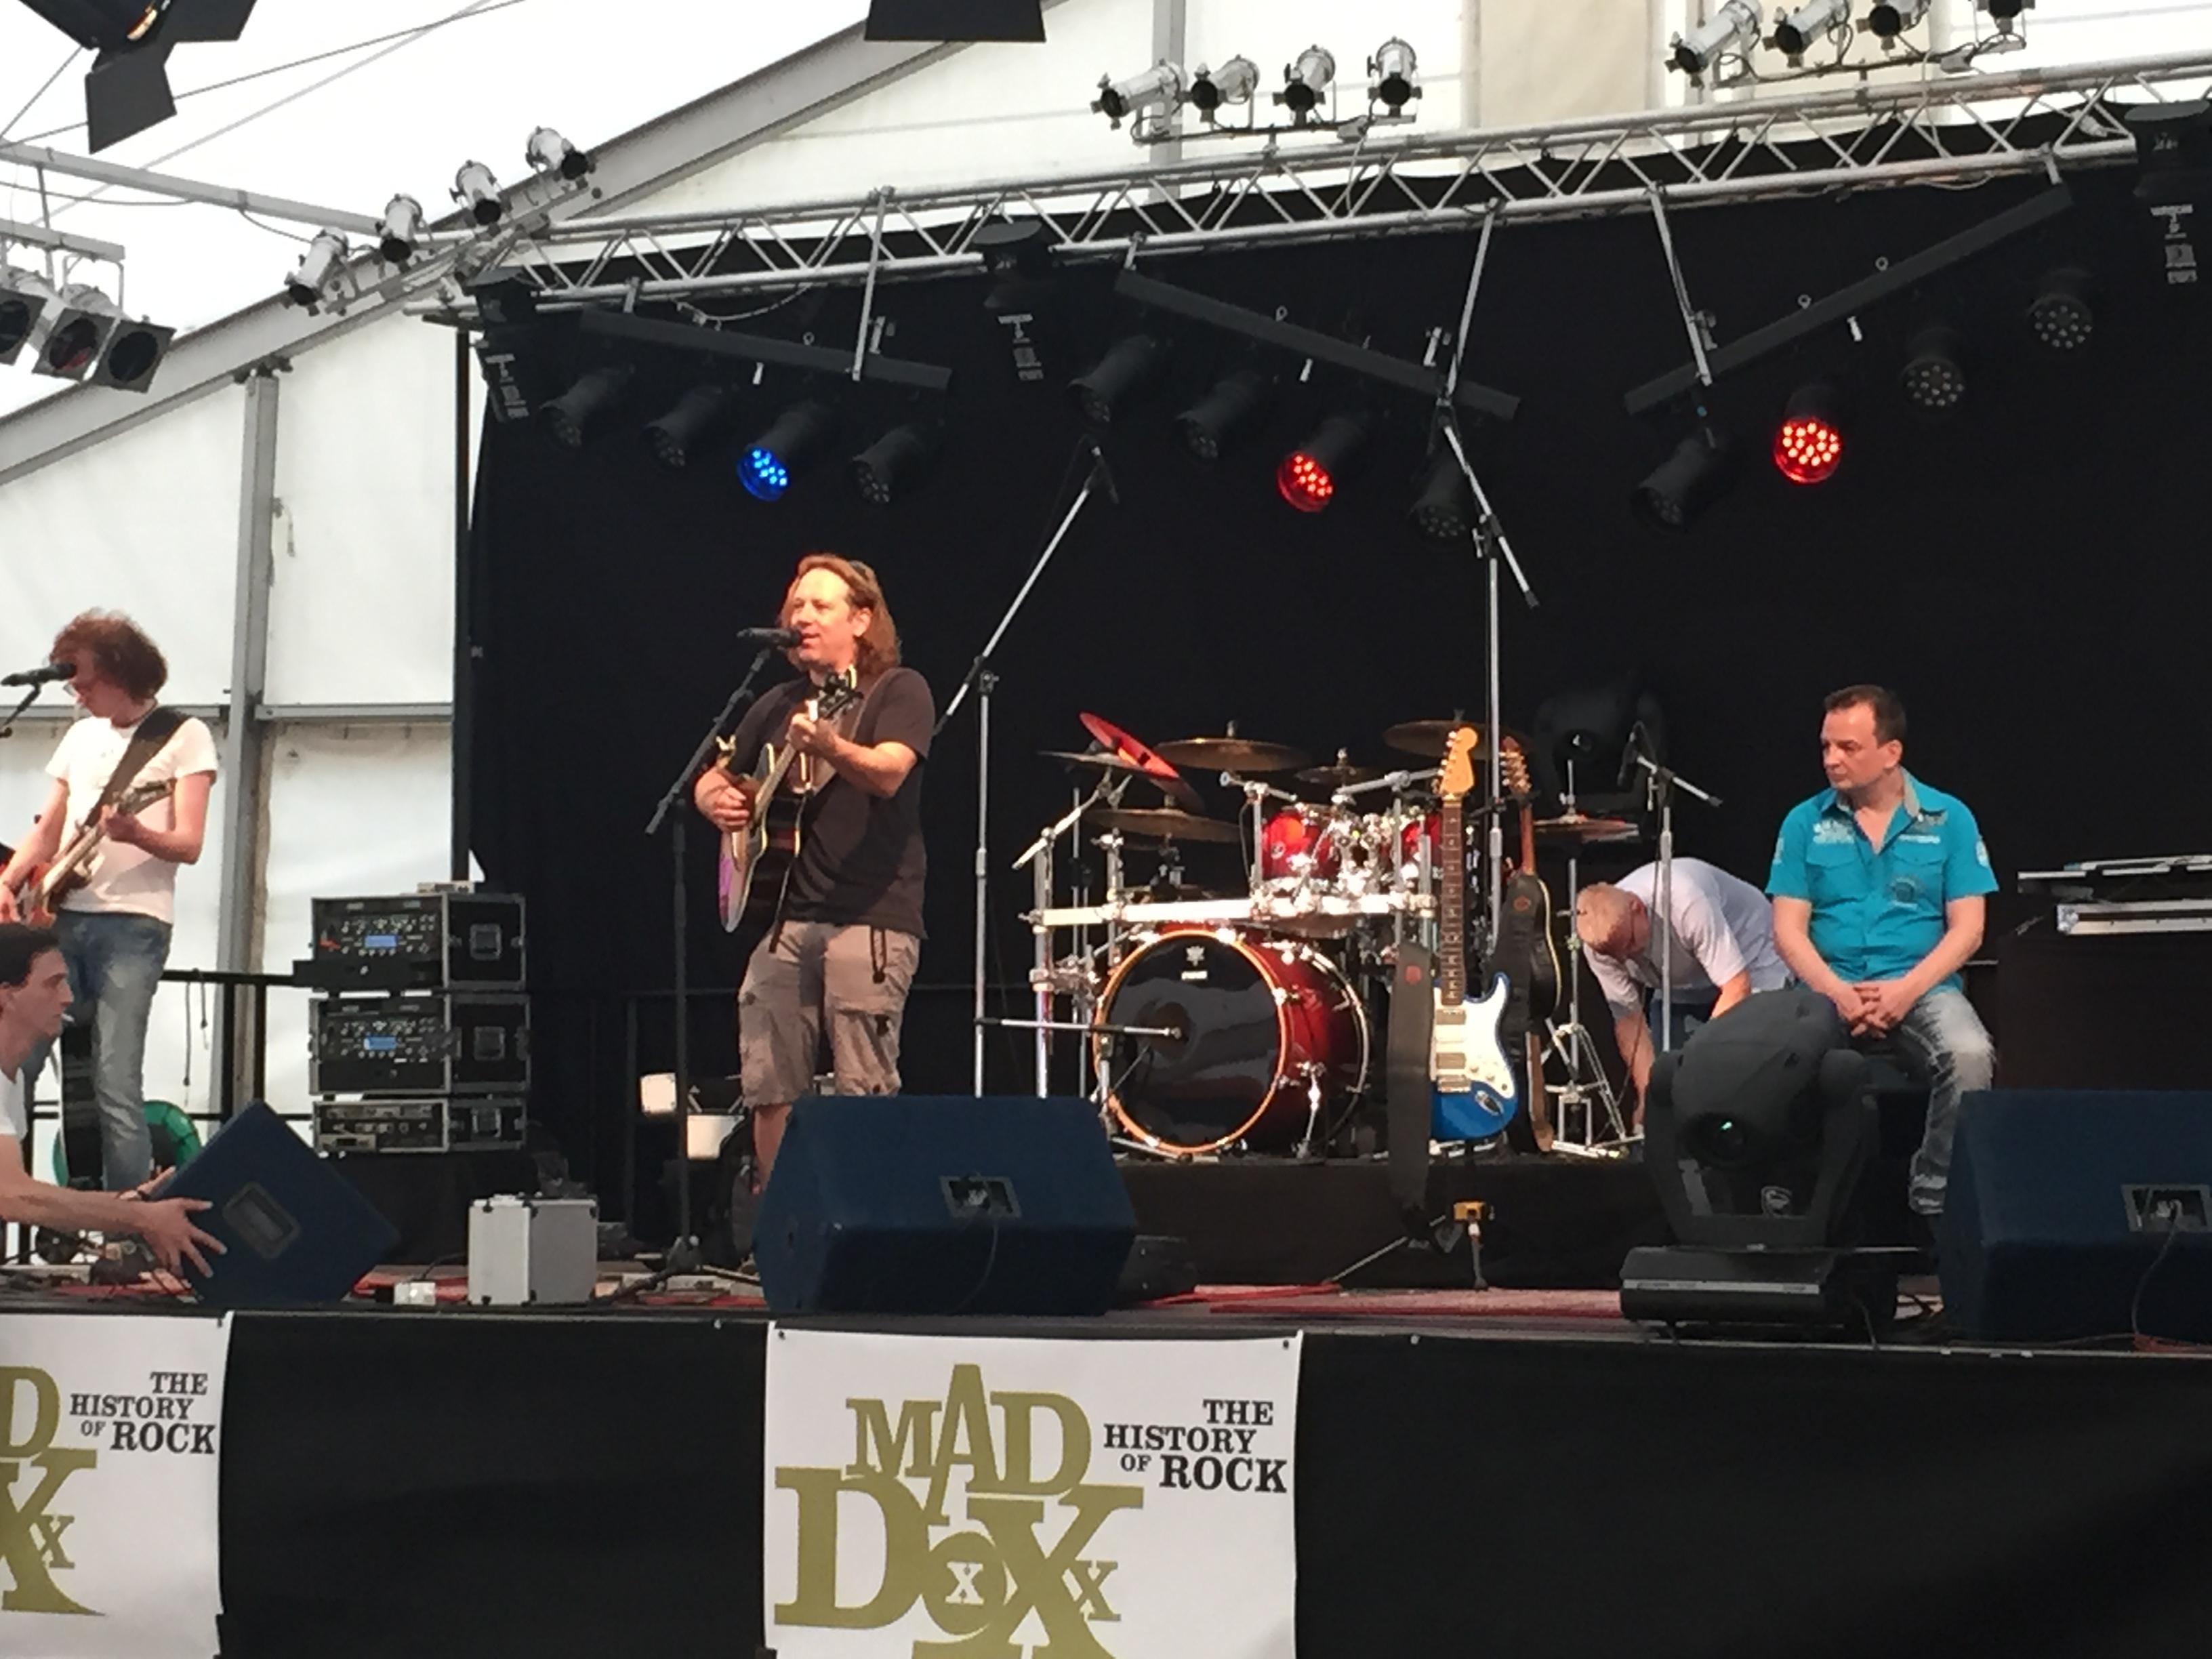 Stadtfest Aue 2015